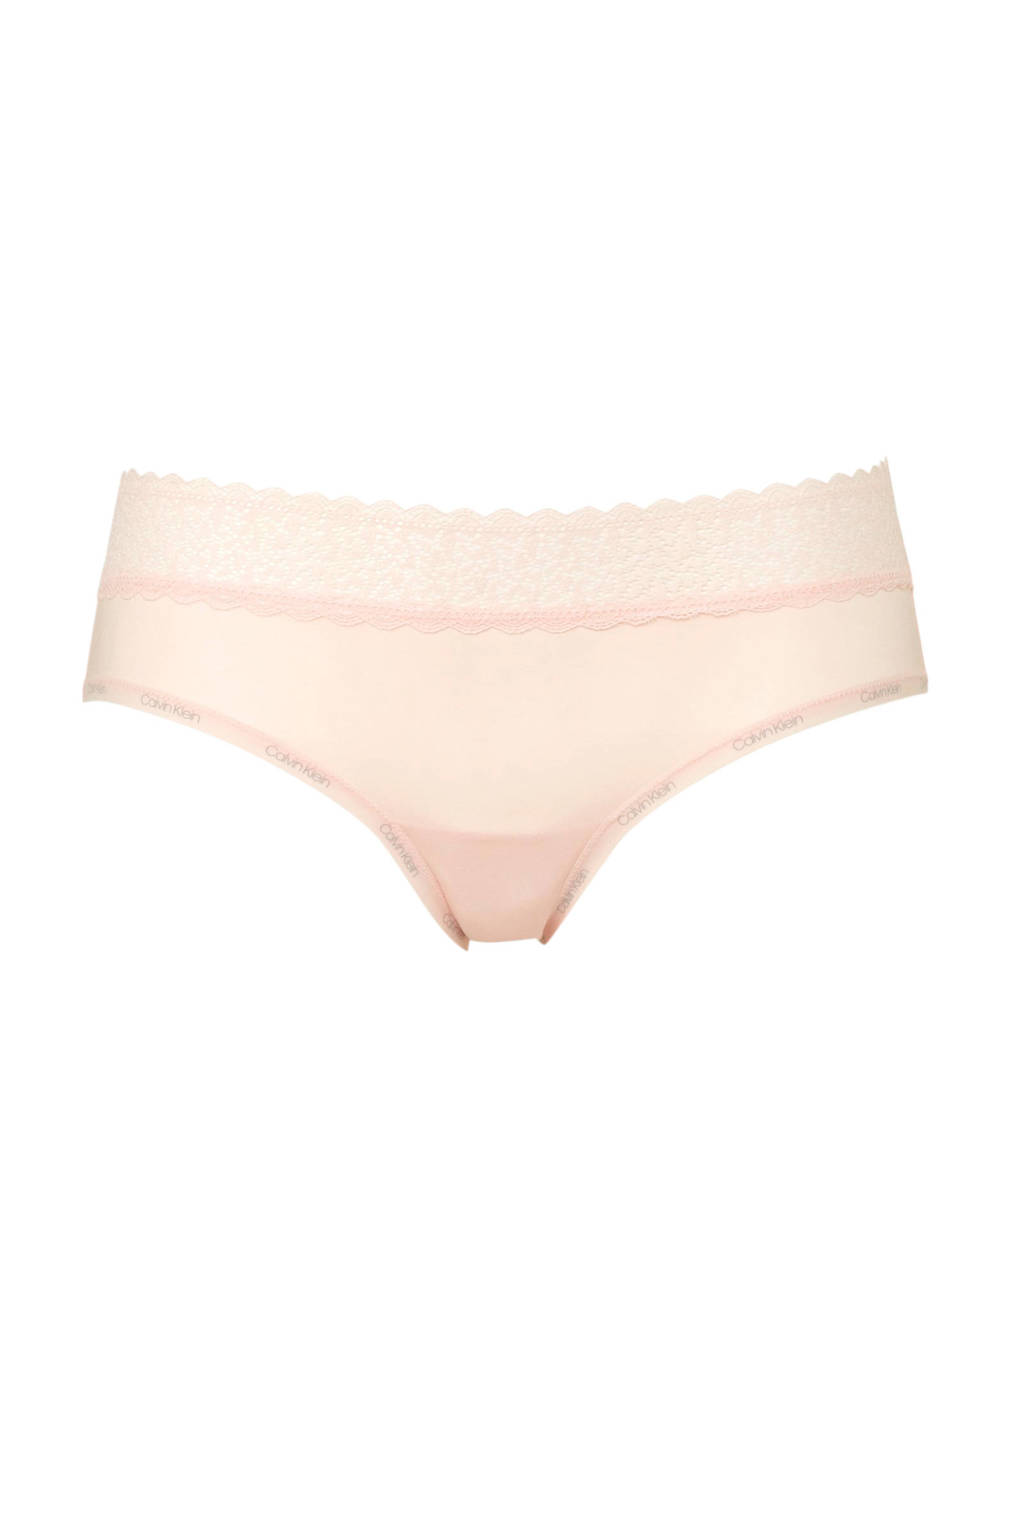 CALVIN KLEIN UNDERWEAR slip Flirty met kant roze, Roze